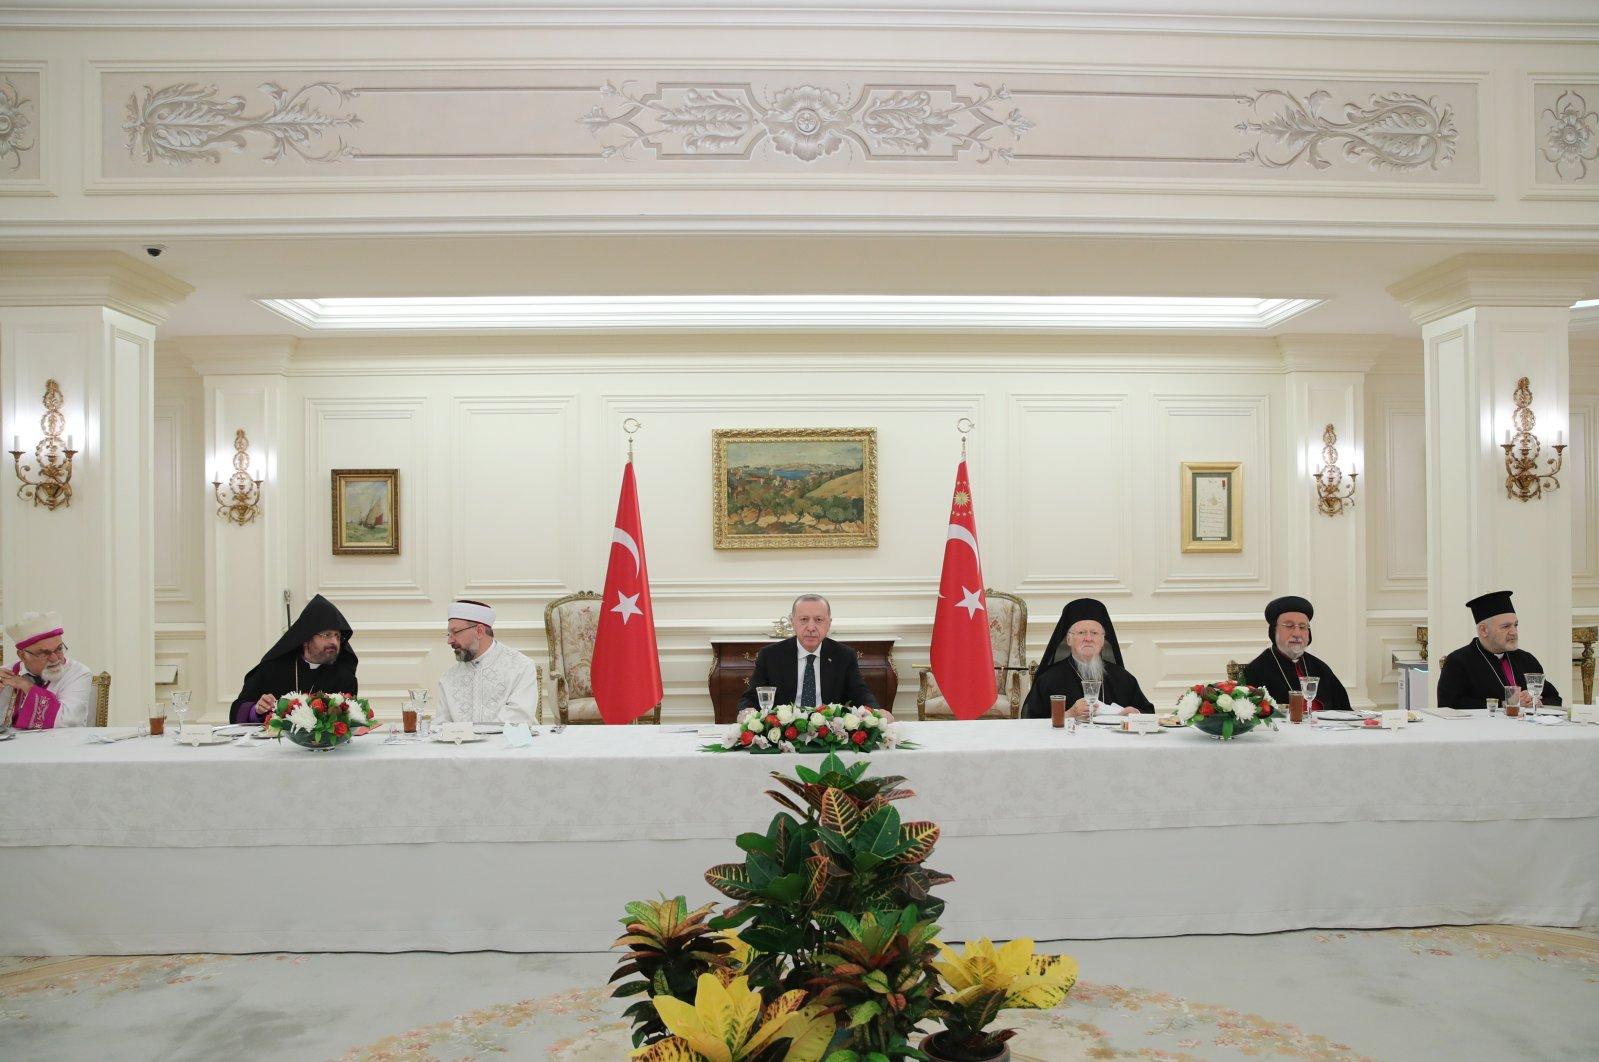 President Recep Tayyip Erdoğan (C) attends an iftar dinner with representatives of Turkey's minority communities at the Presidential Complex in Ankara, Turkey, May 5, 2021. (AA Photo)